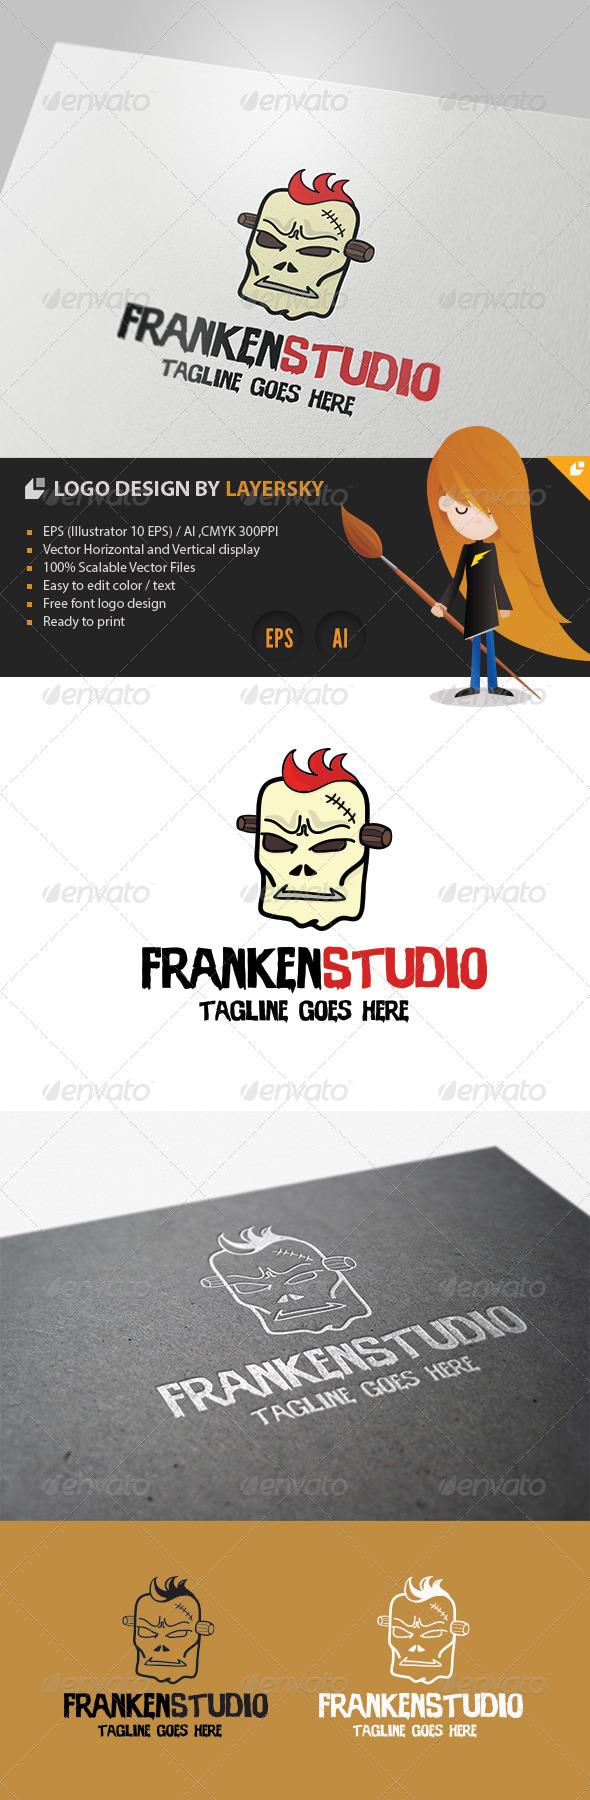 GraphicRiver Franken Studio Logo 4339629